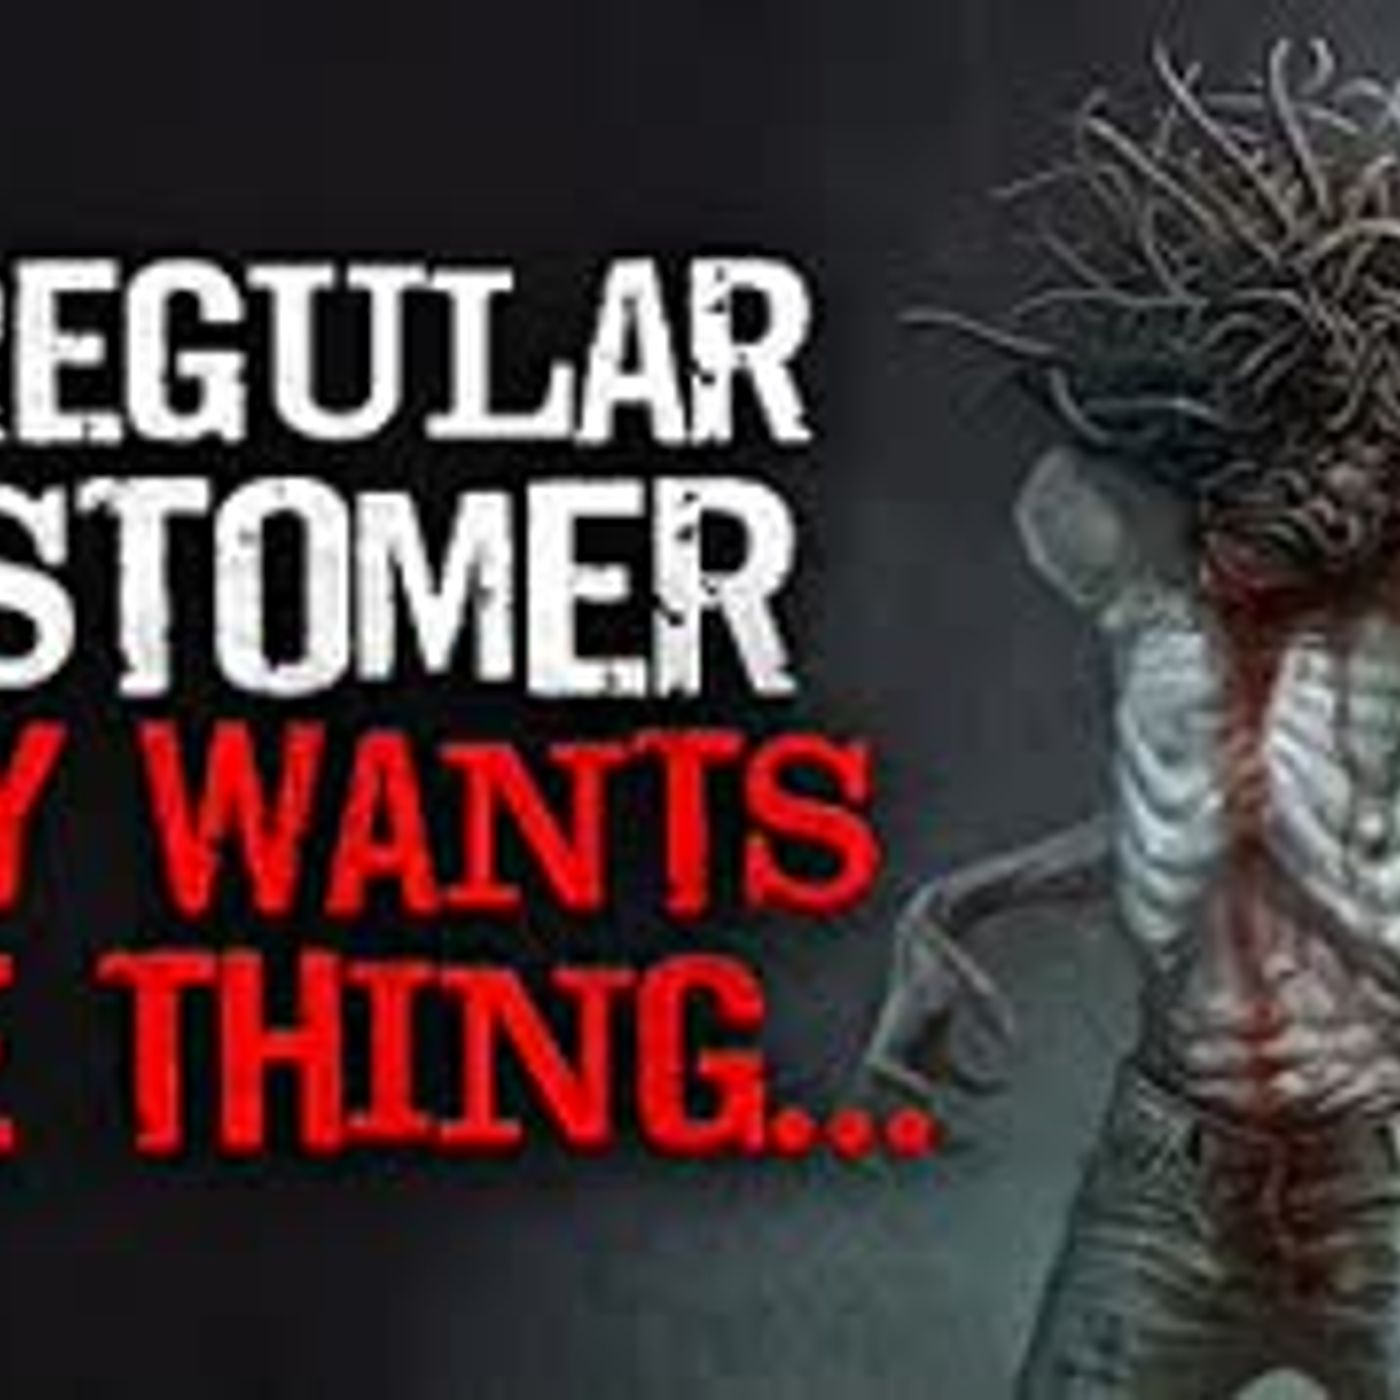 """My regular customer only wants one thing"" Creepypasta"